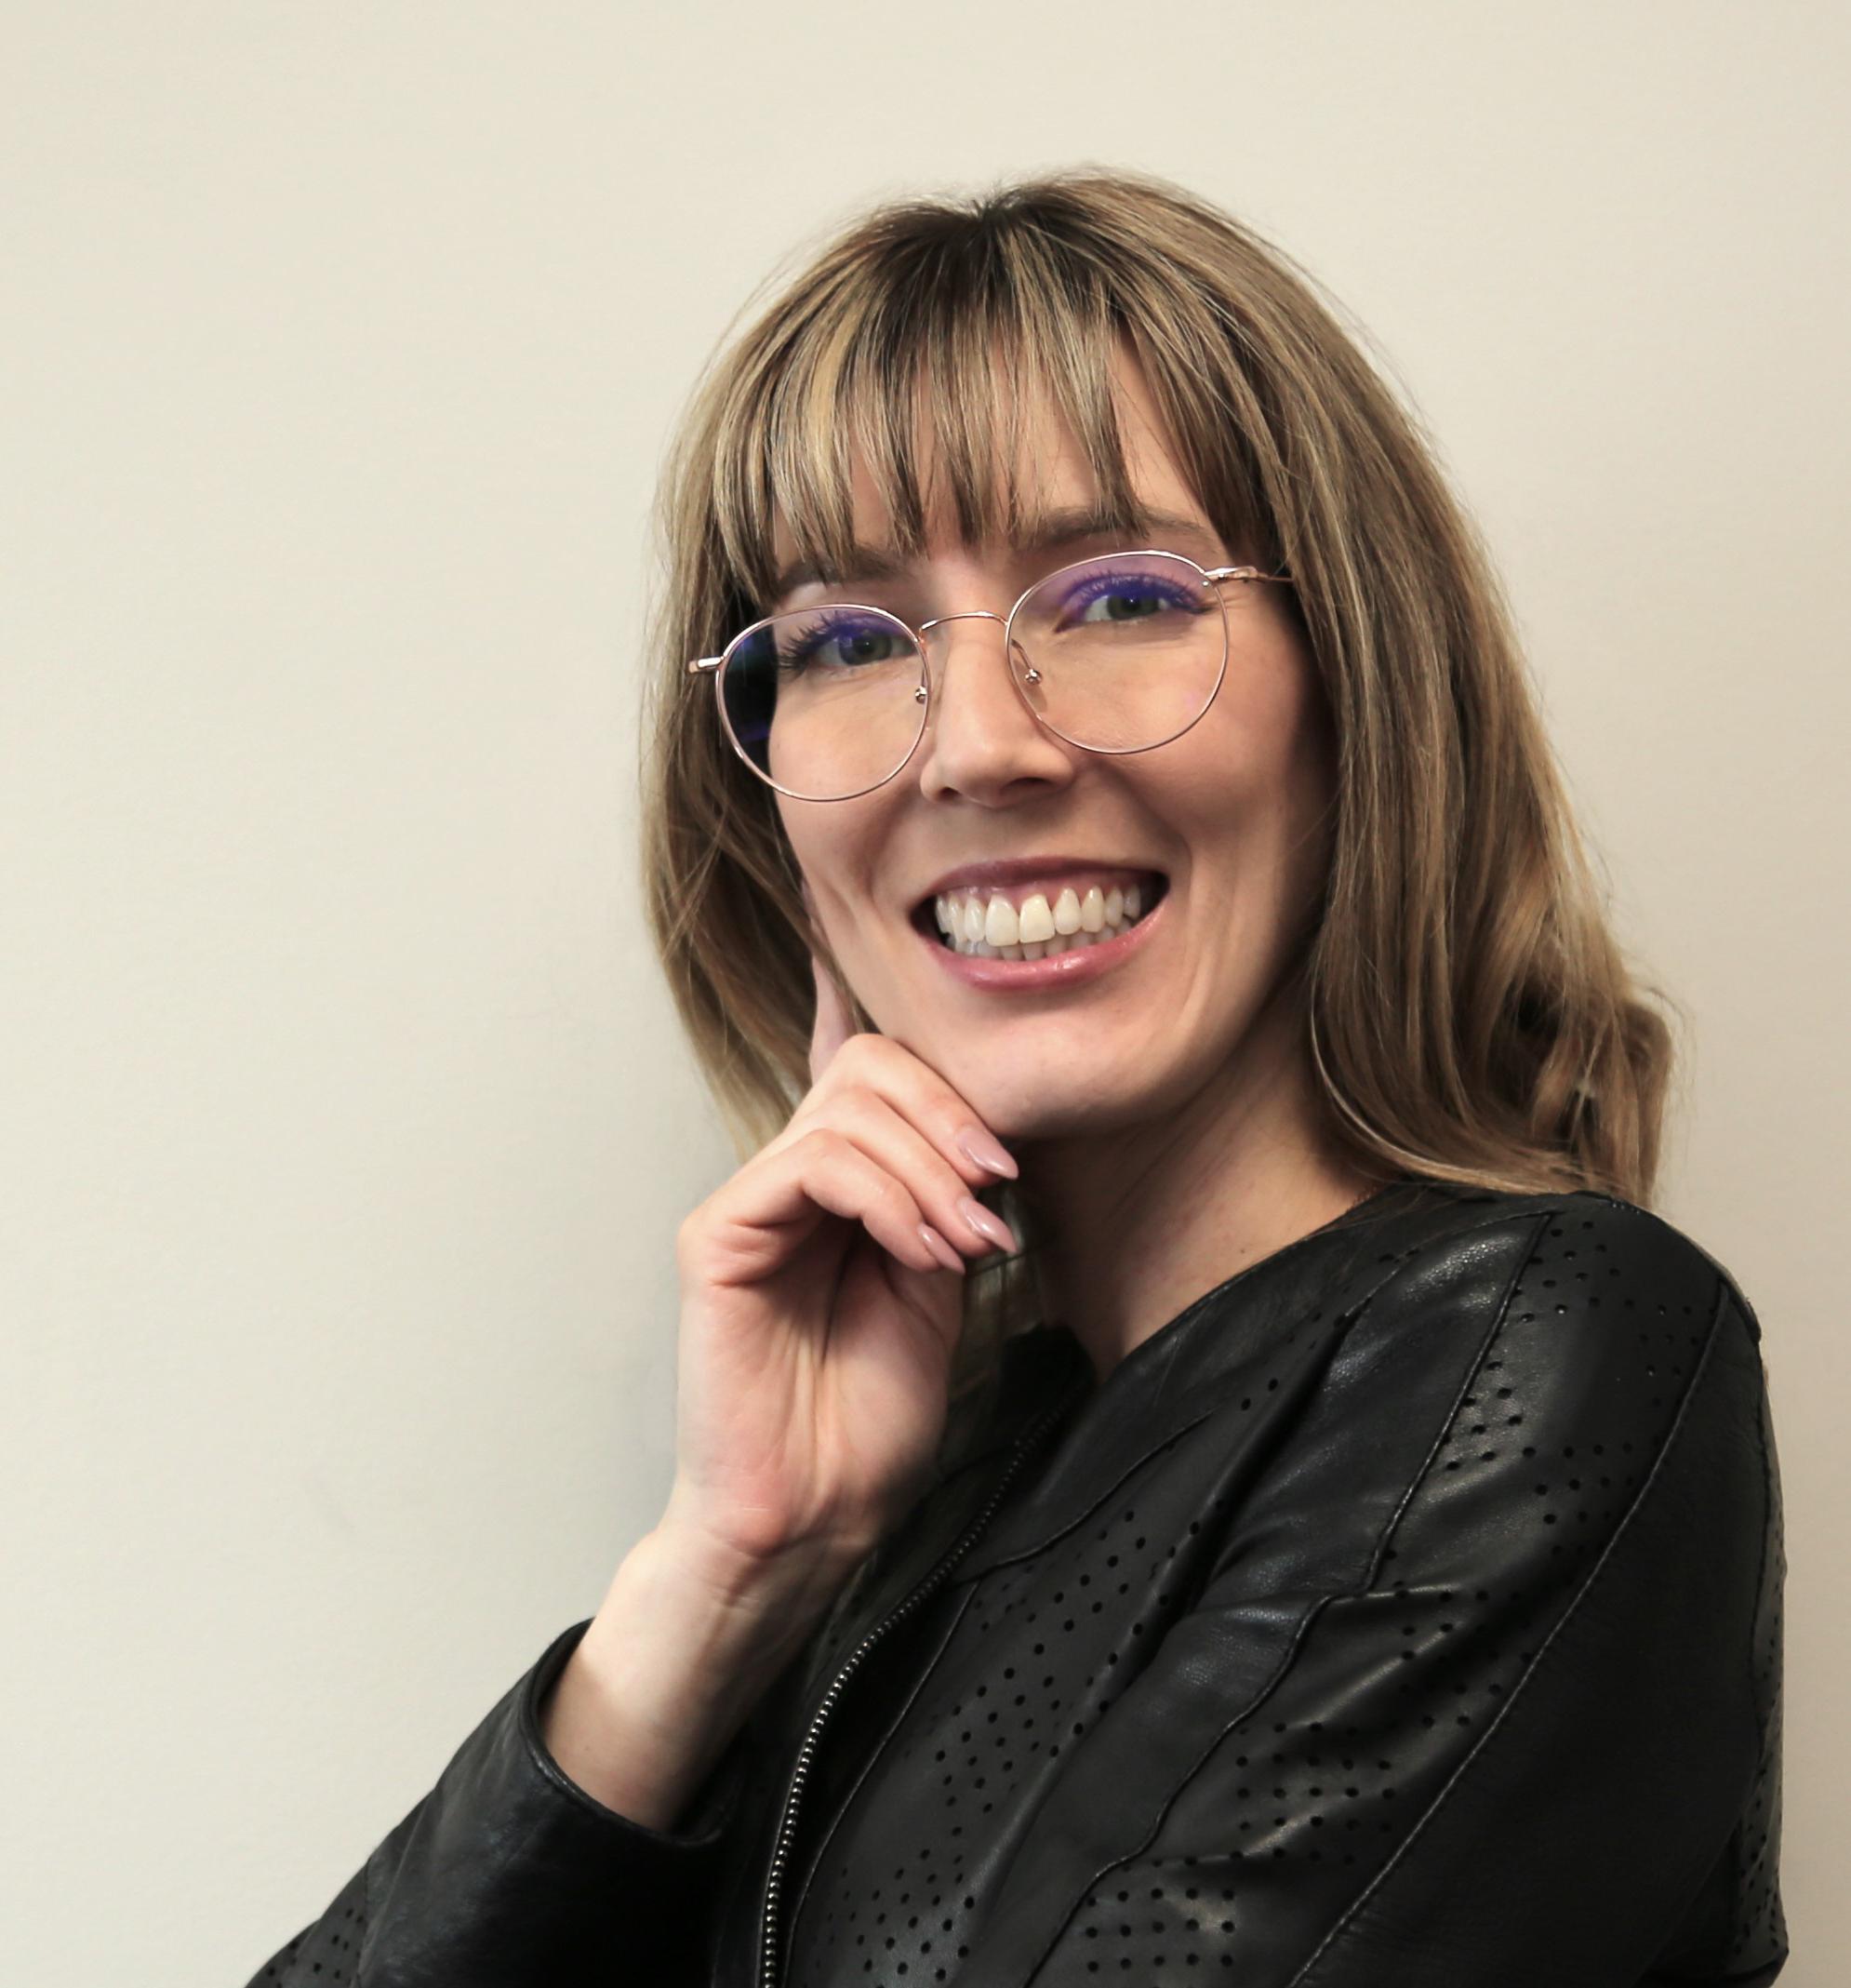 Krystal Olson